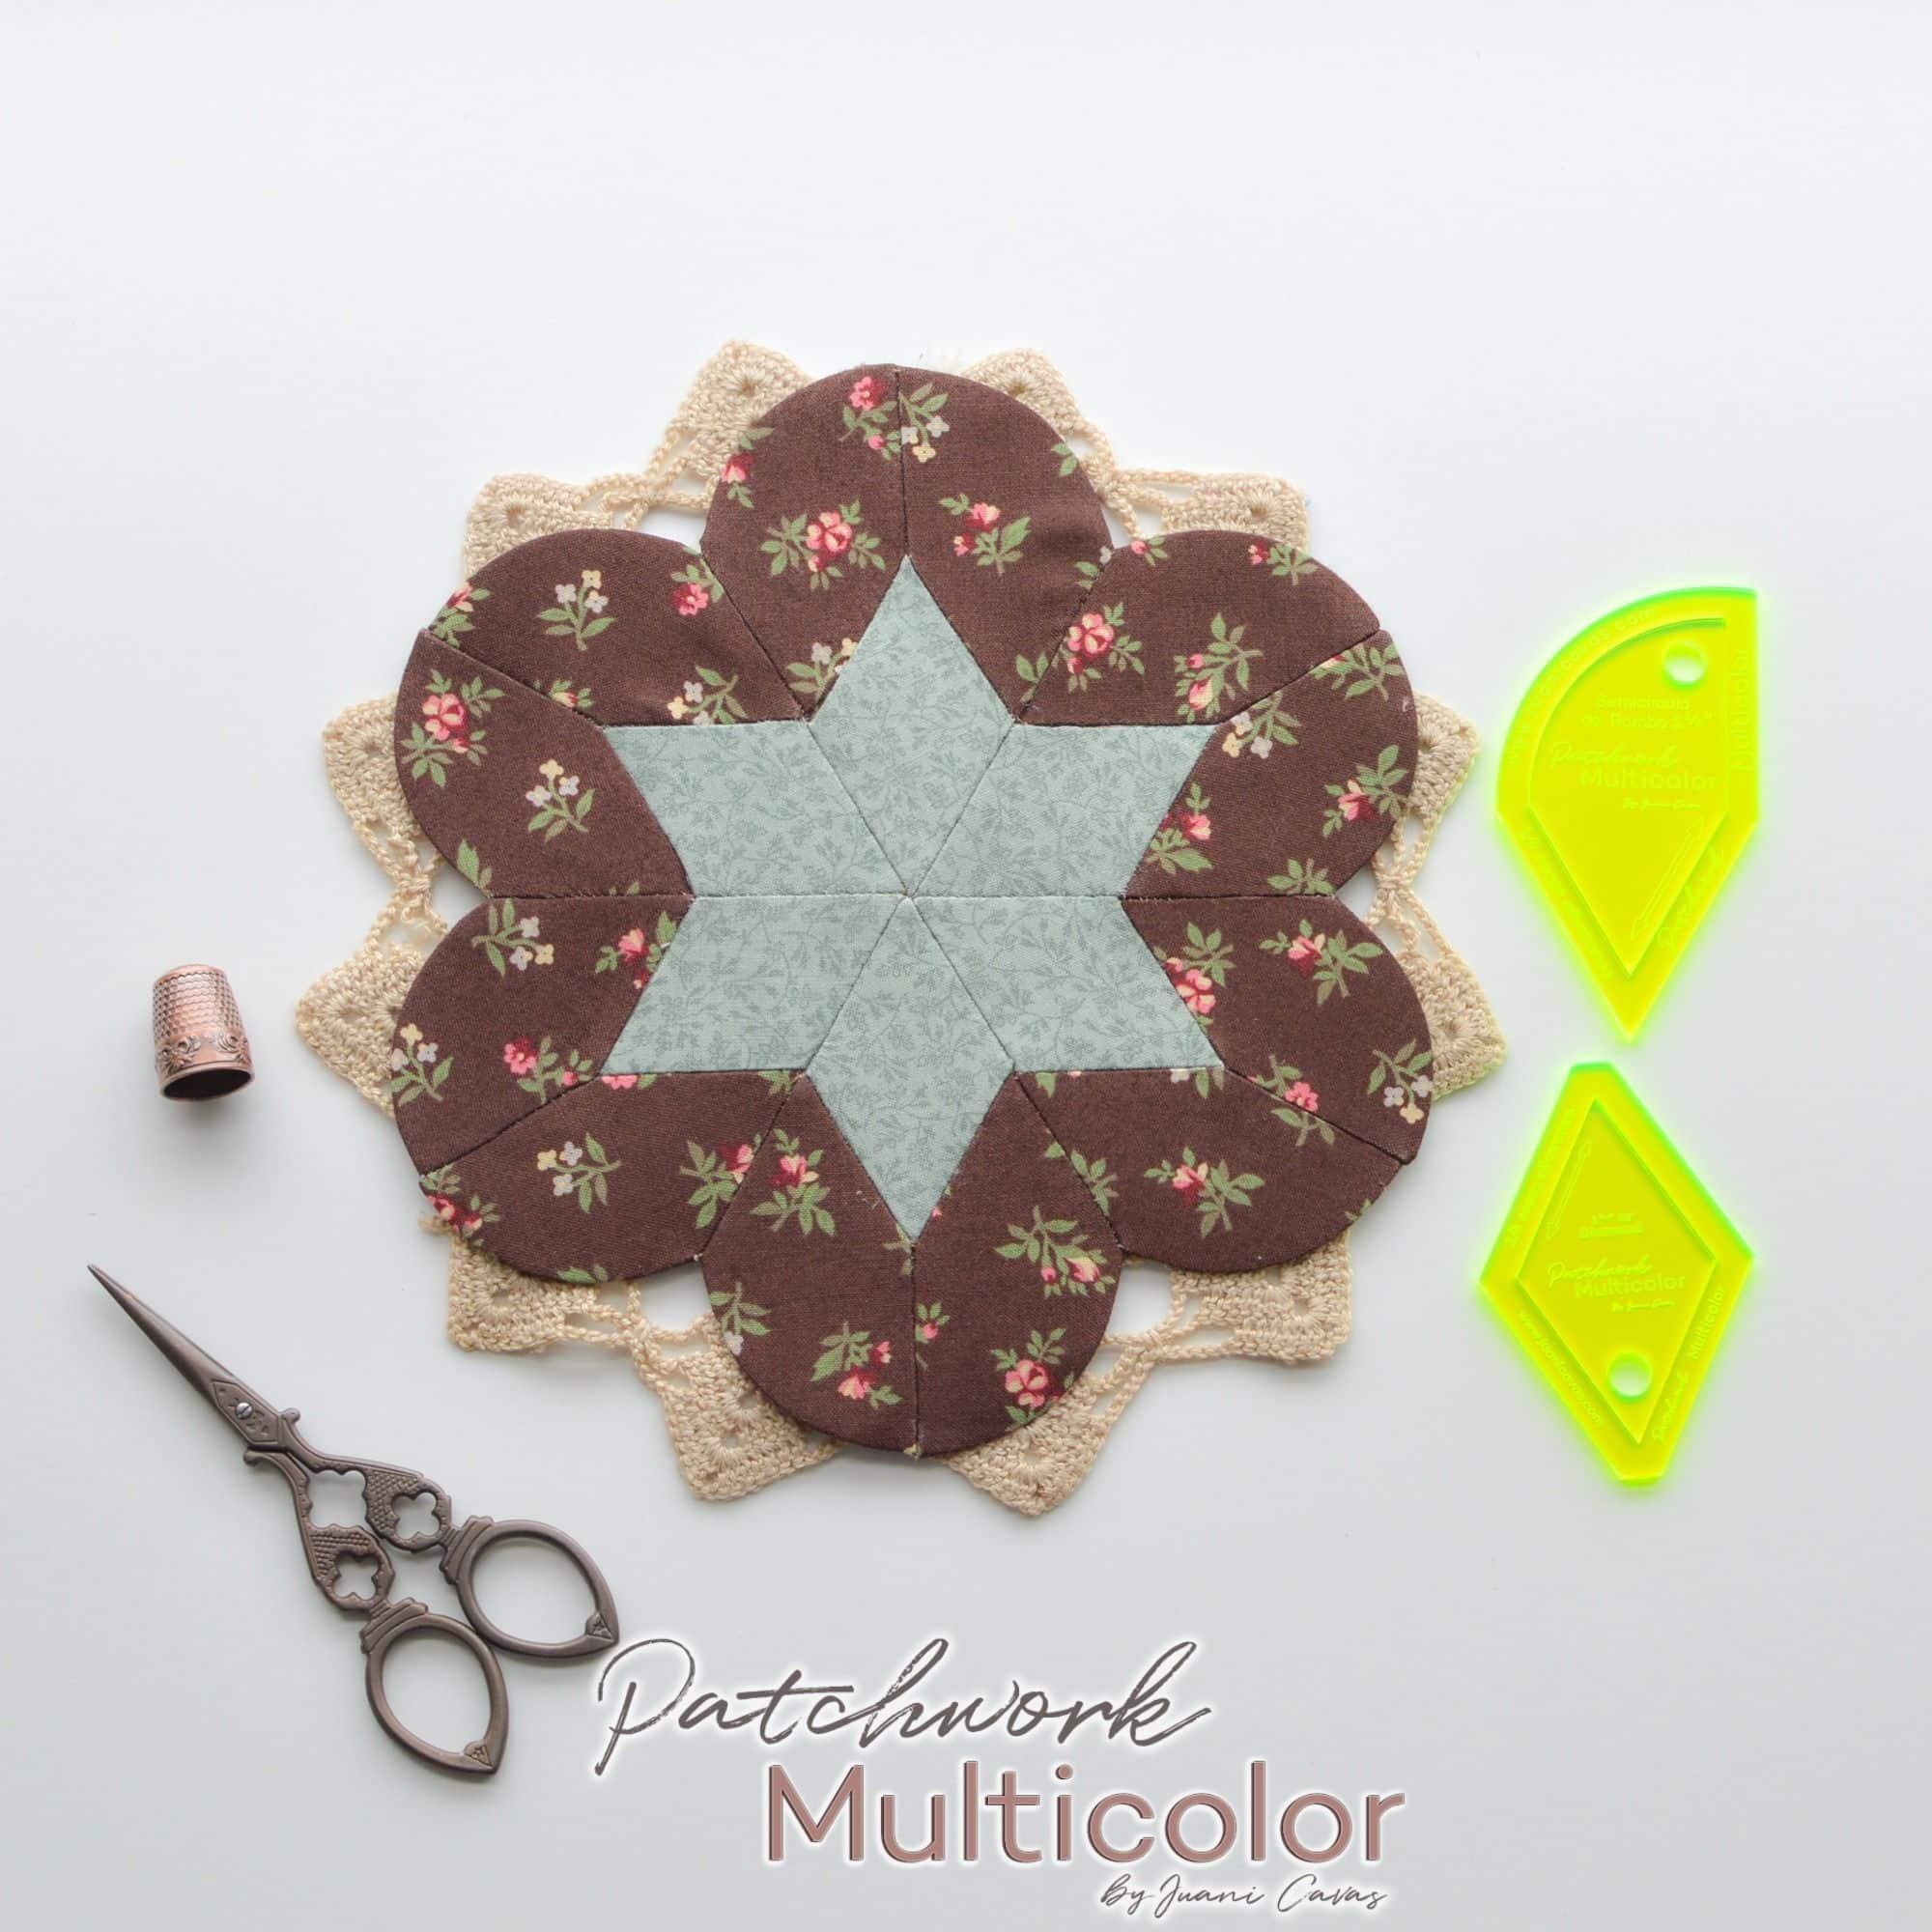 flor de patchwork rombo y semicirculo